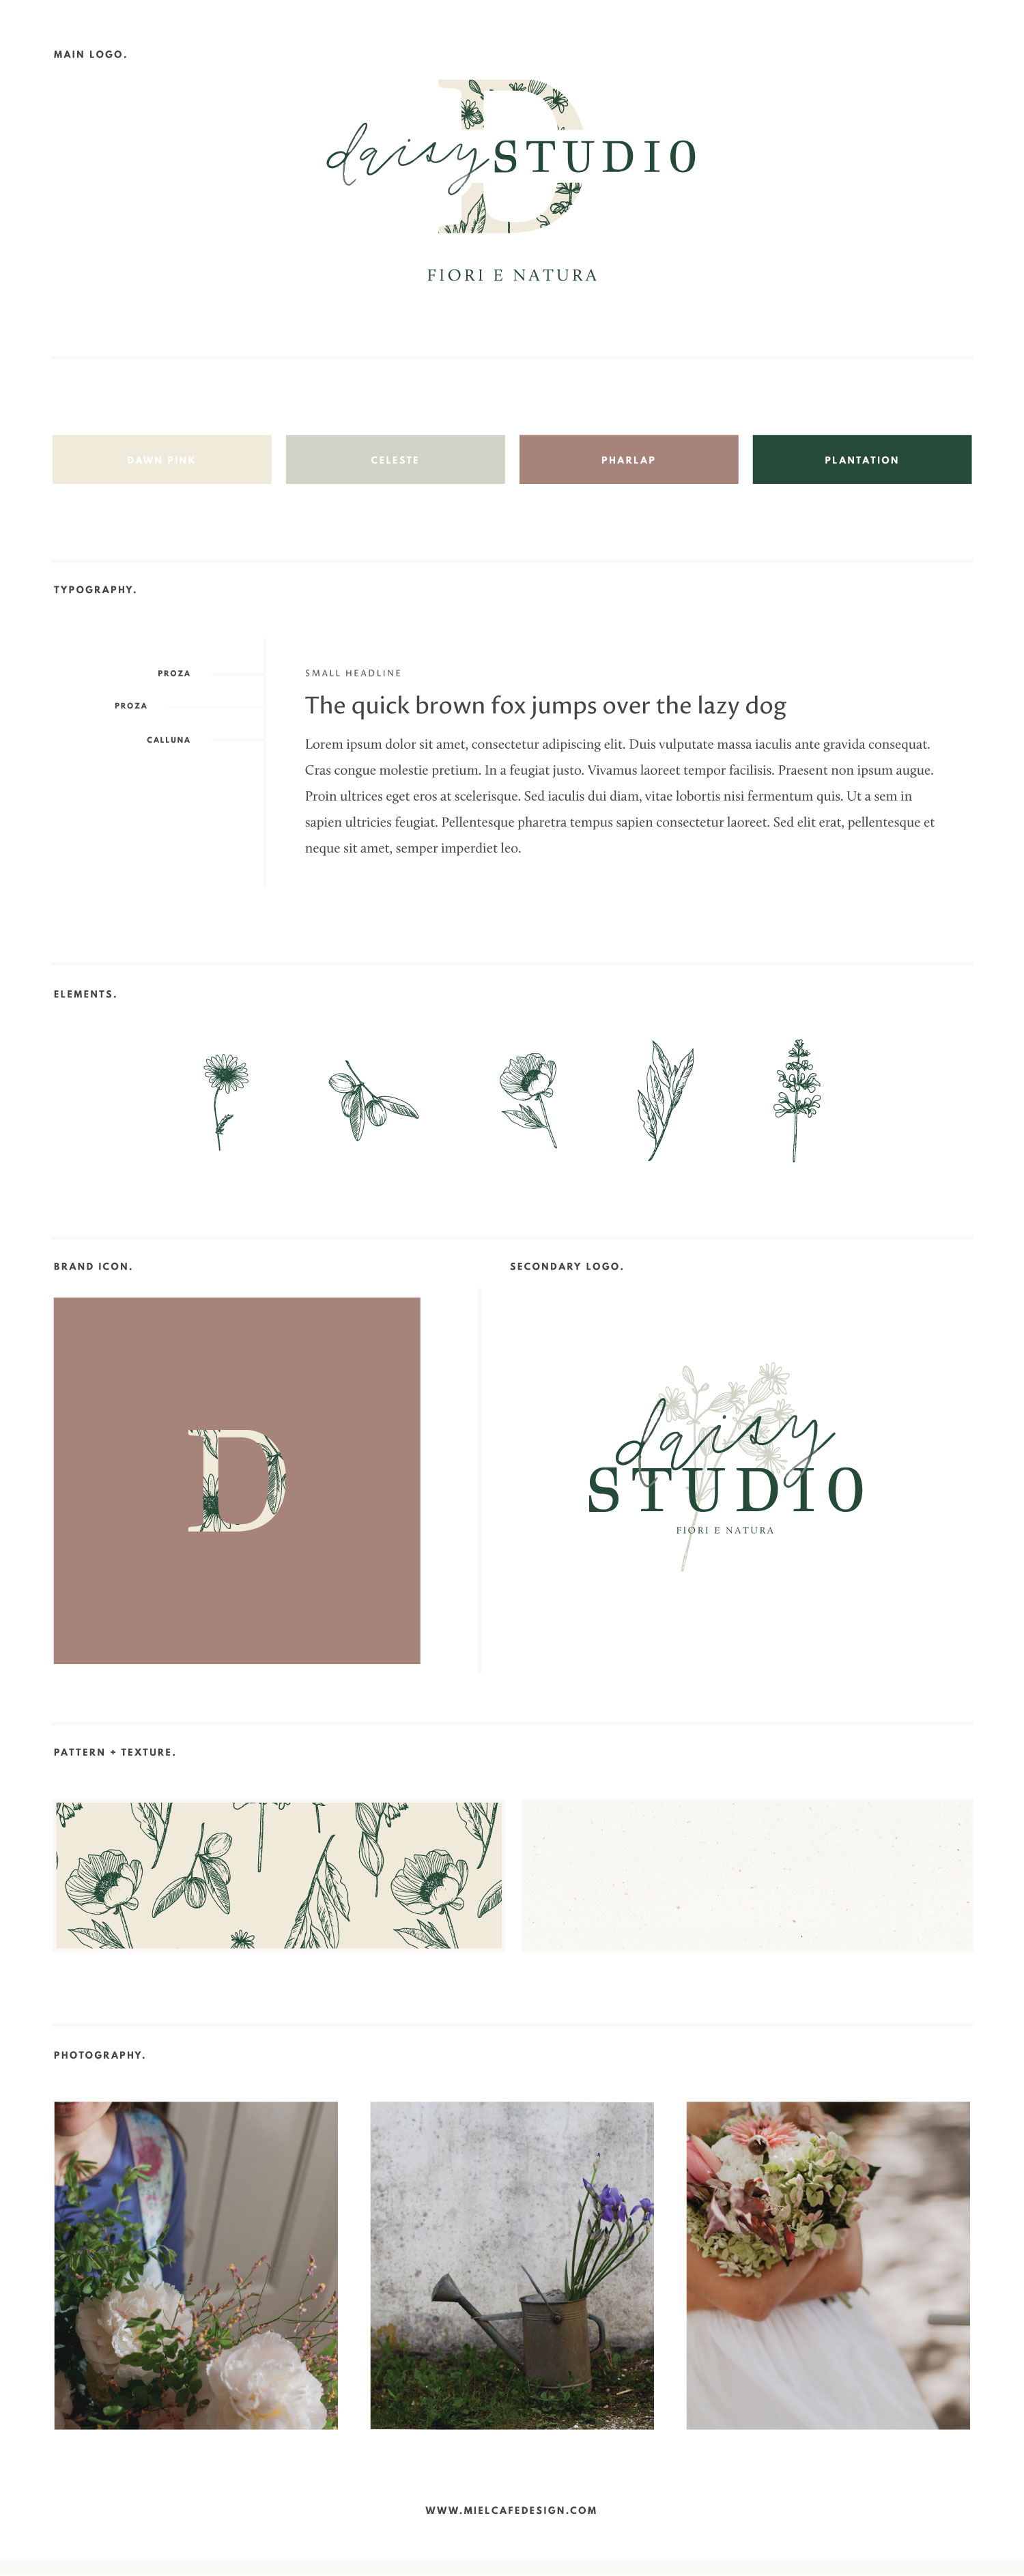 Miel Café Design Portfolio: Brand board botanica floreale per floral designer Daisy Studio